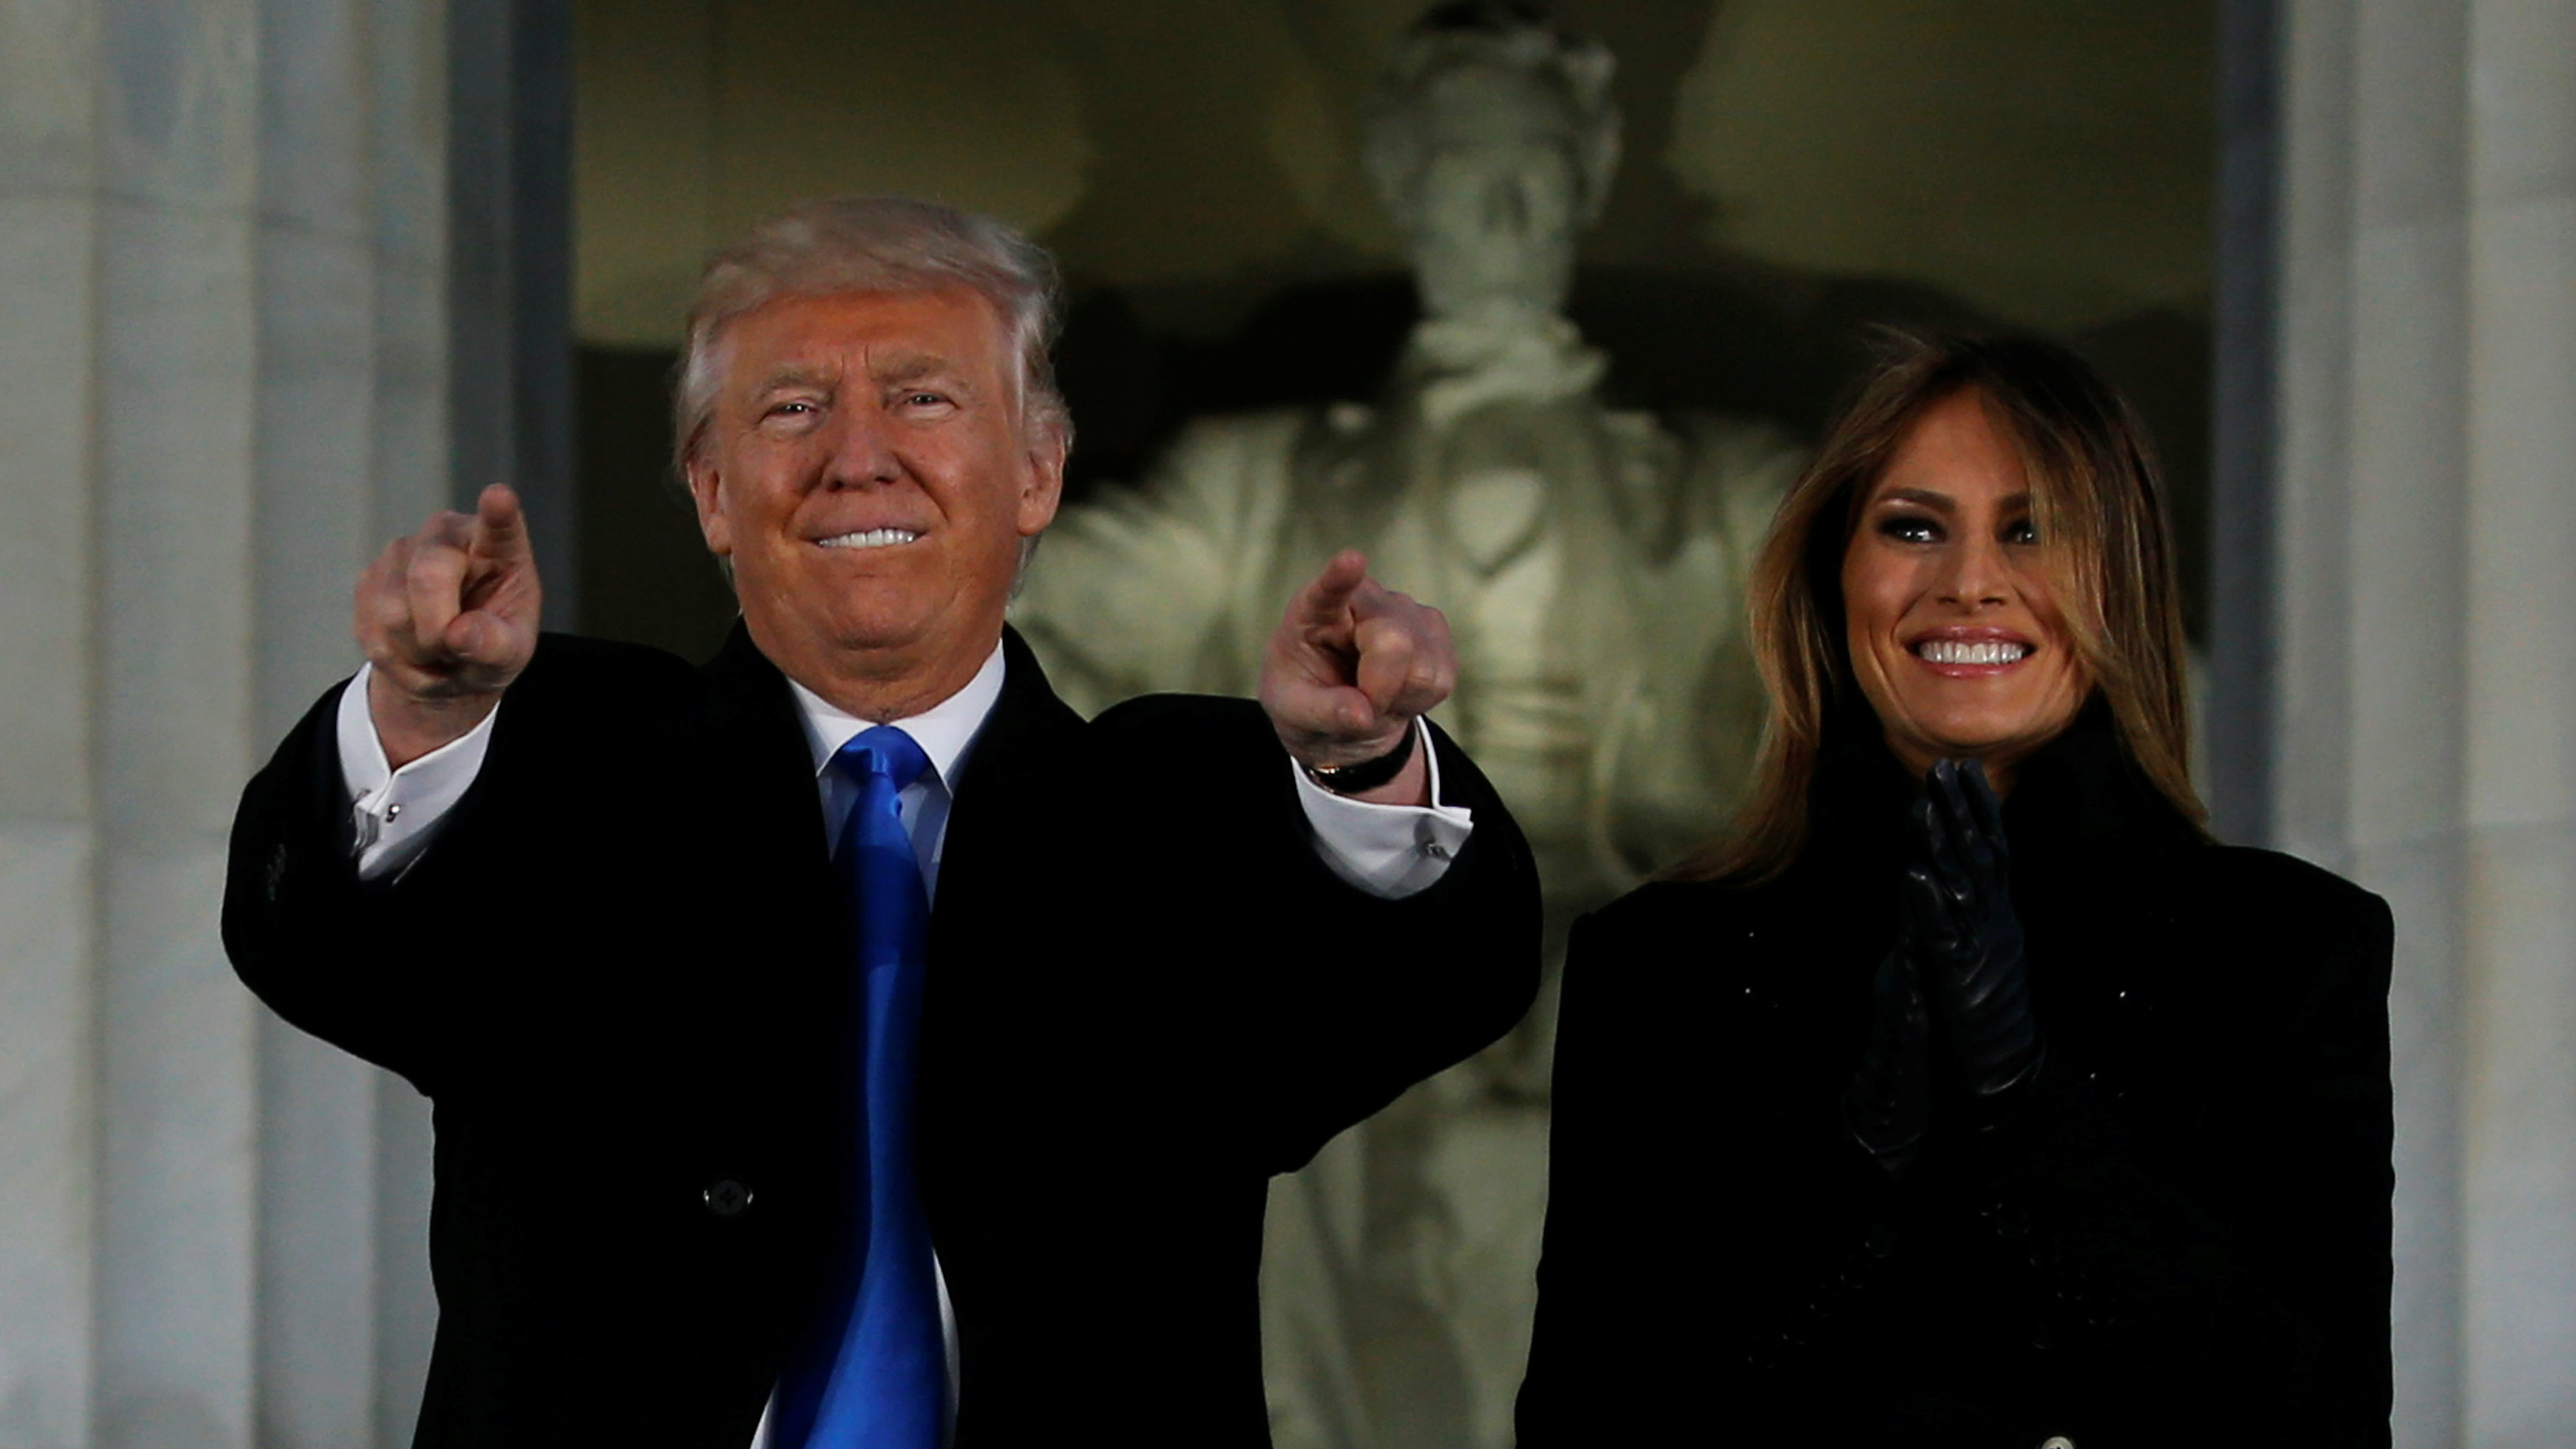 Donald and Melania Trump at Lincoln memorial concert